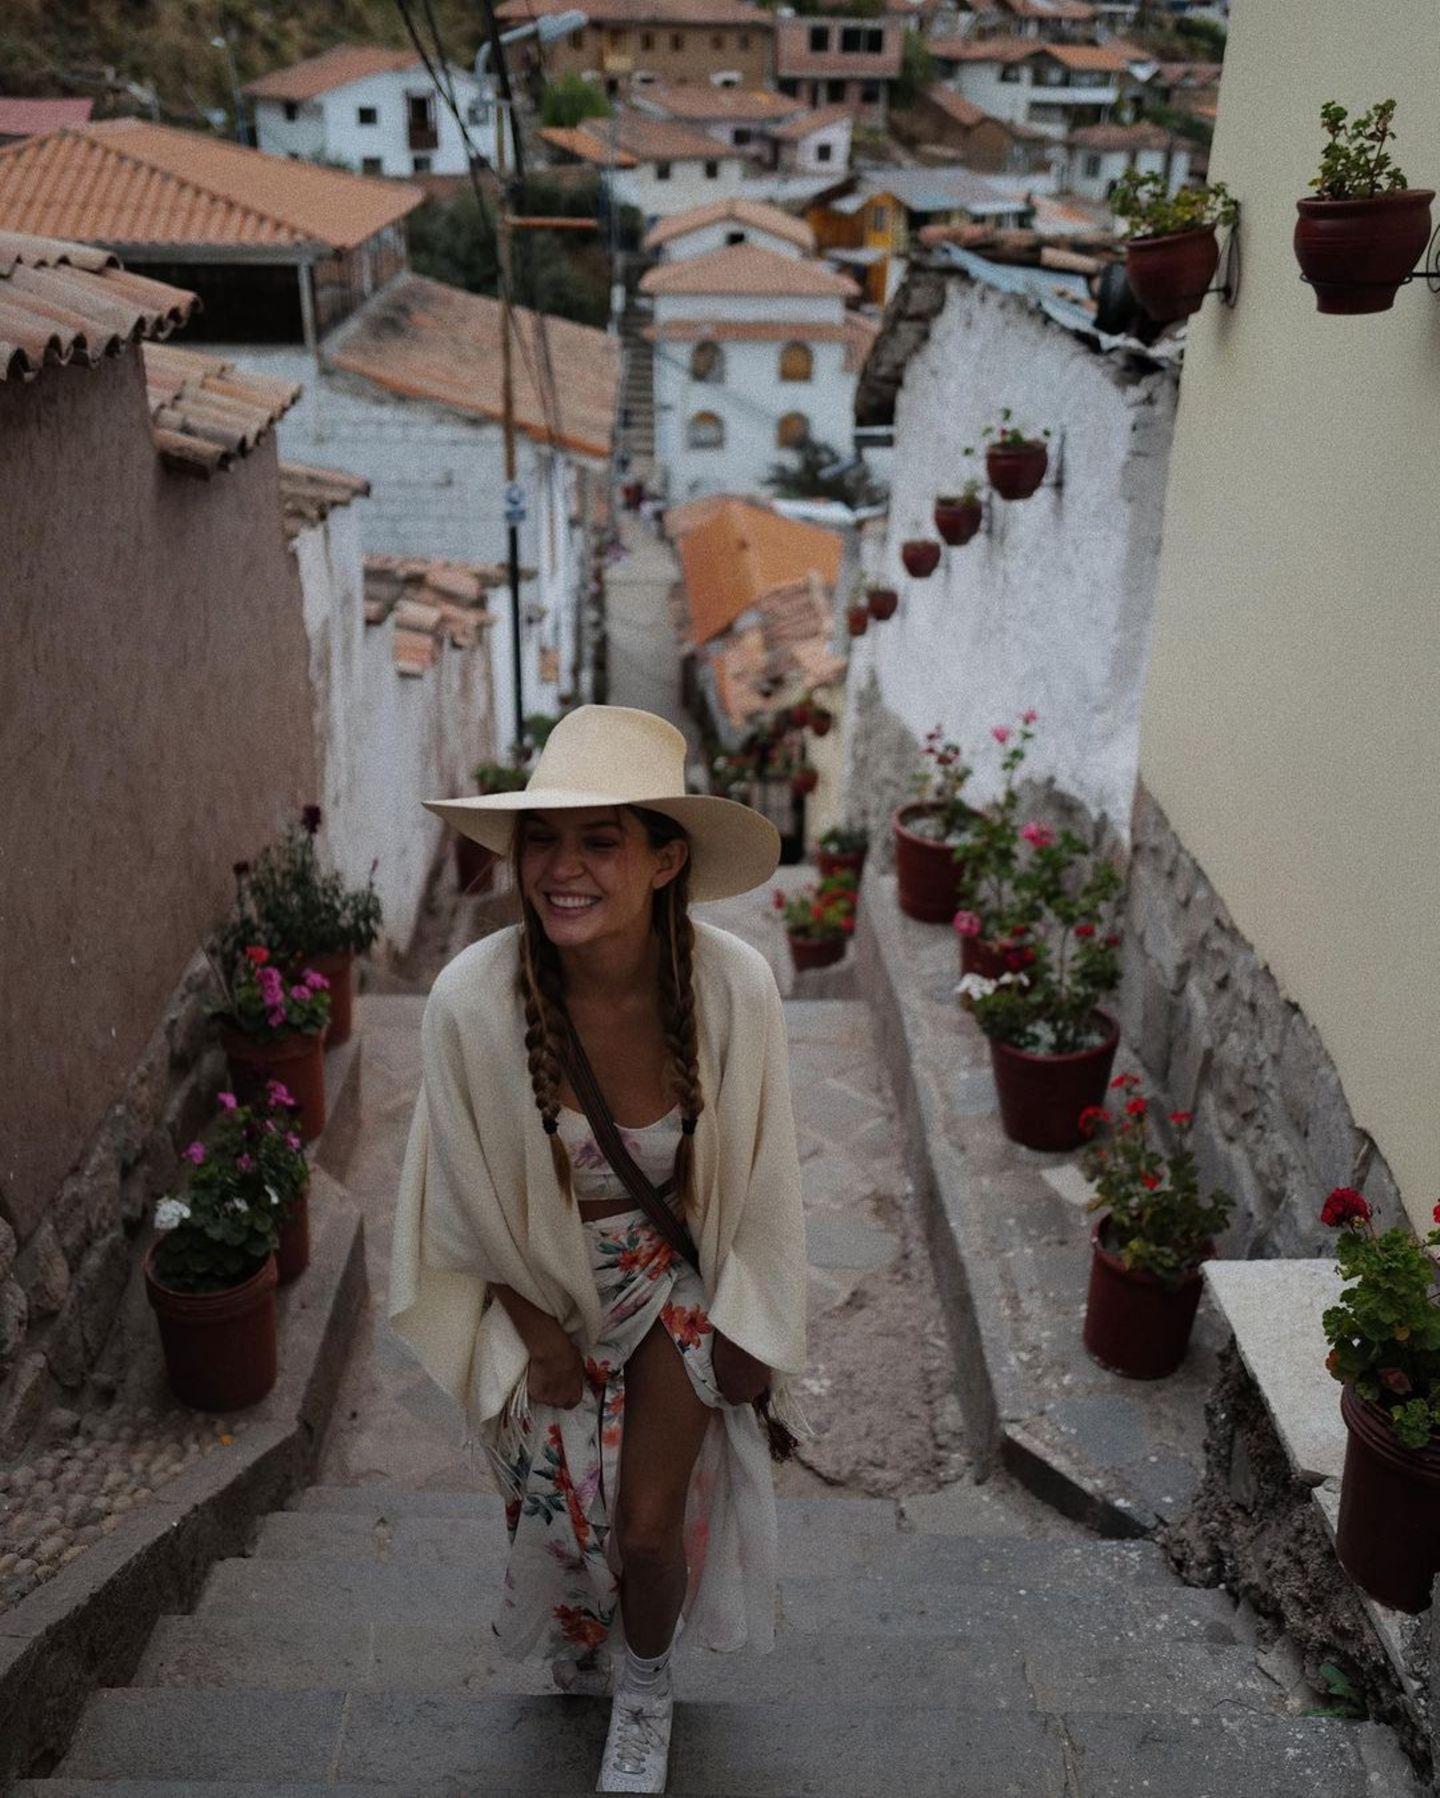 Urlaubsgrüße: Josephine Skriver in Peru